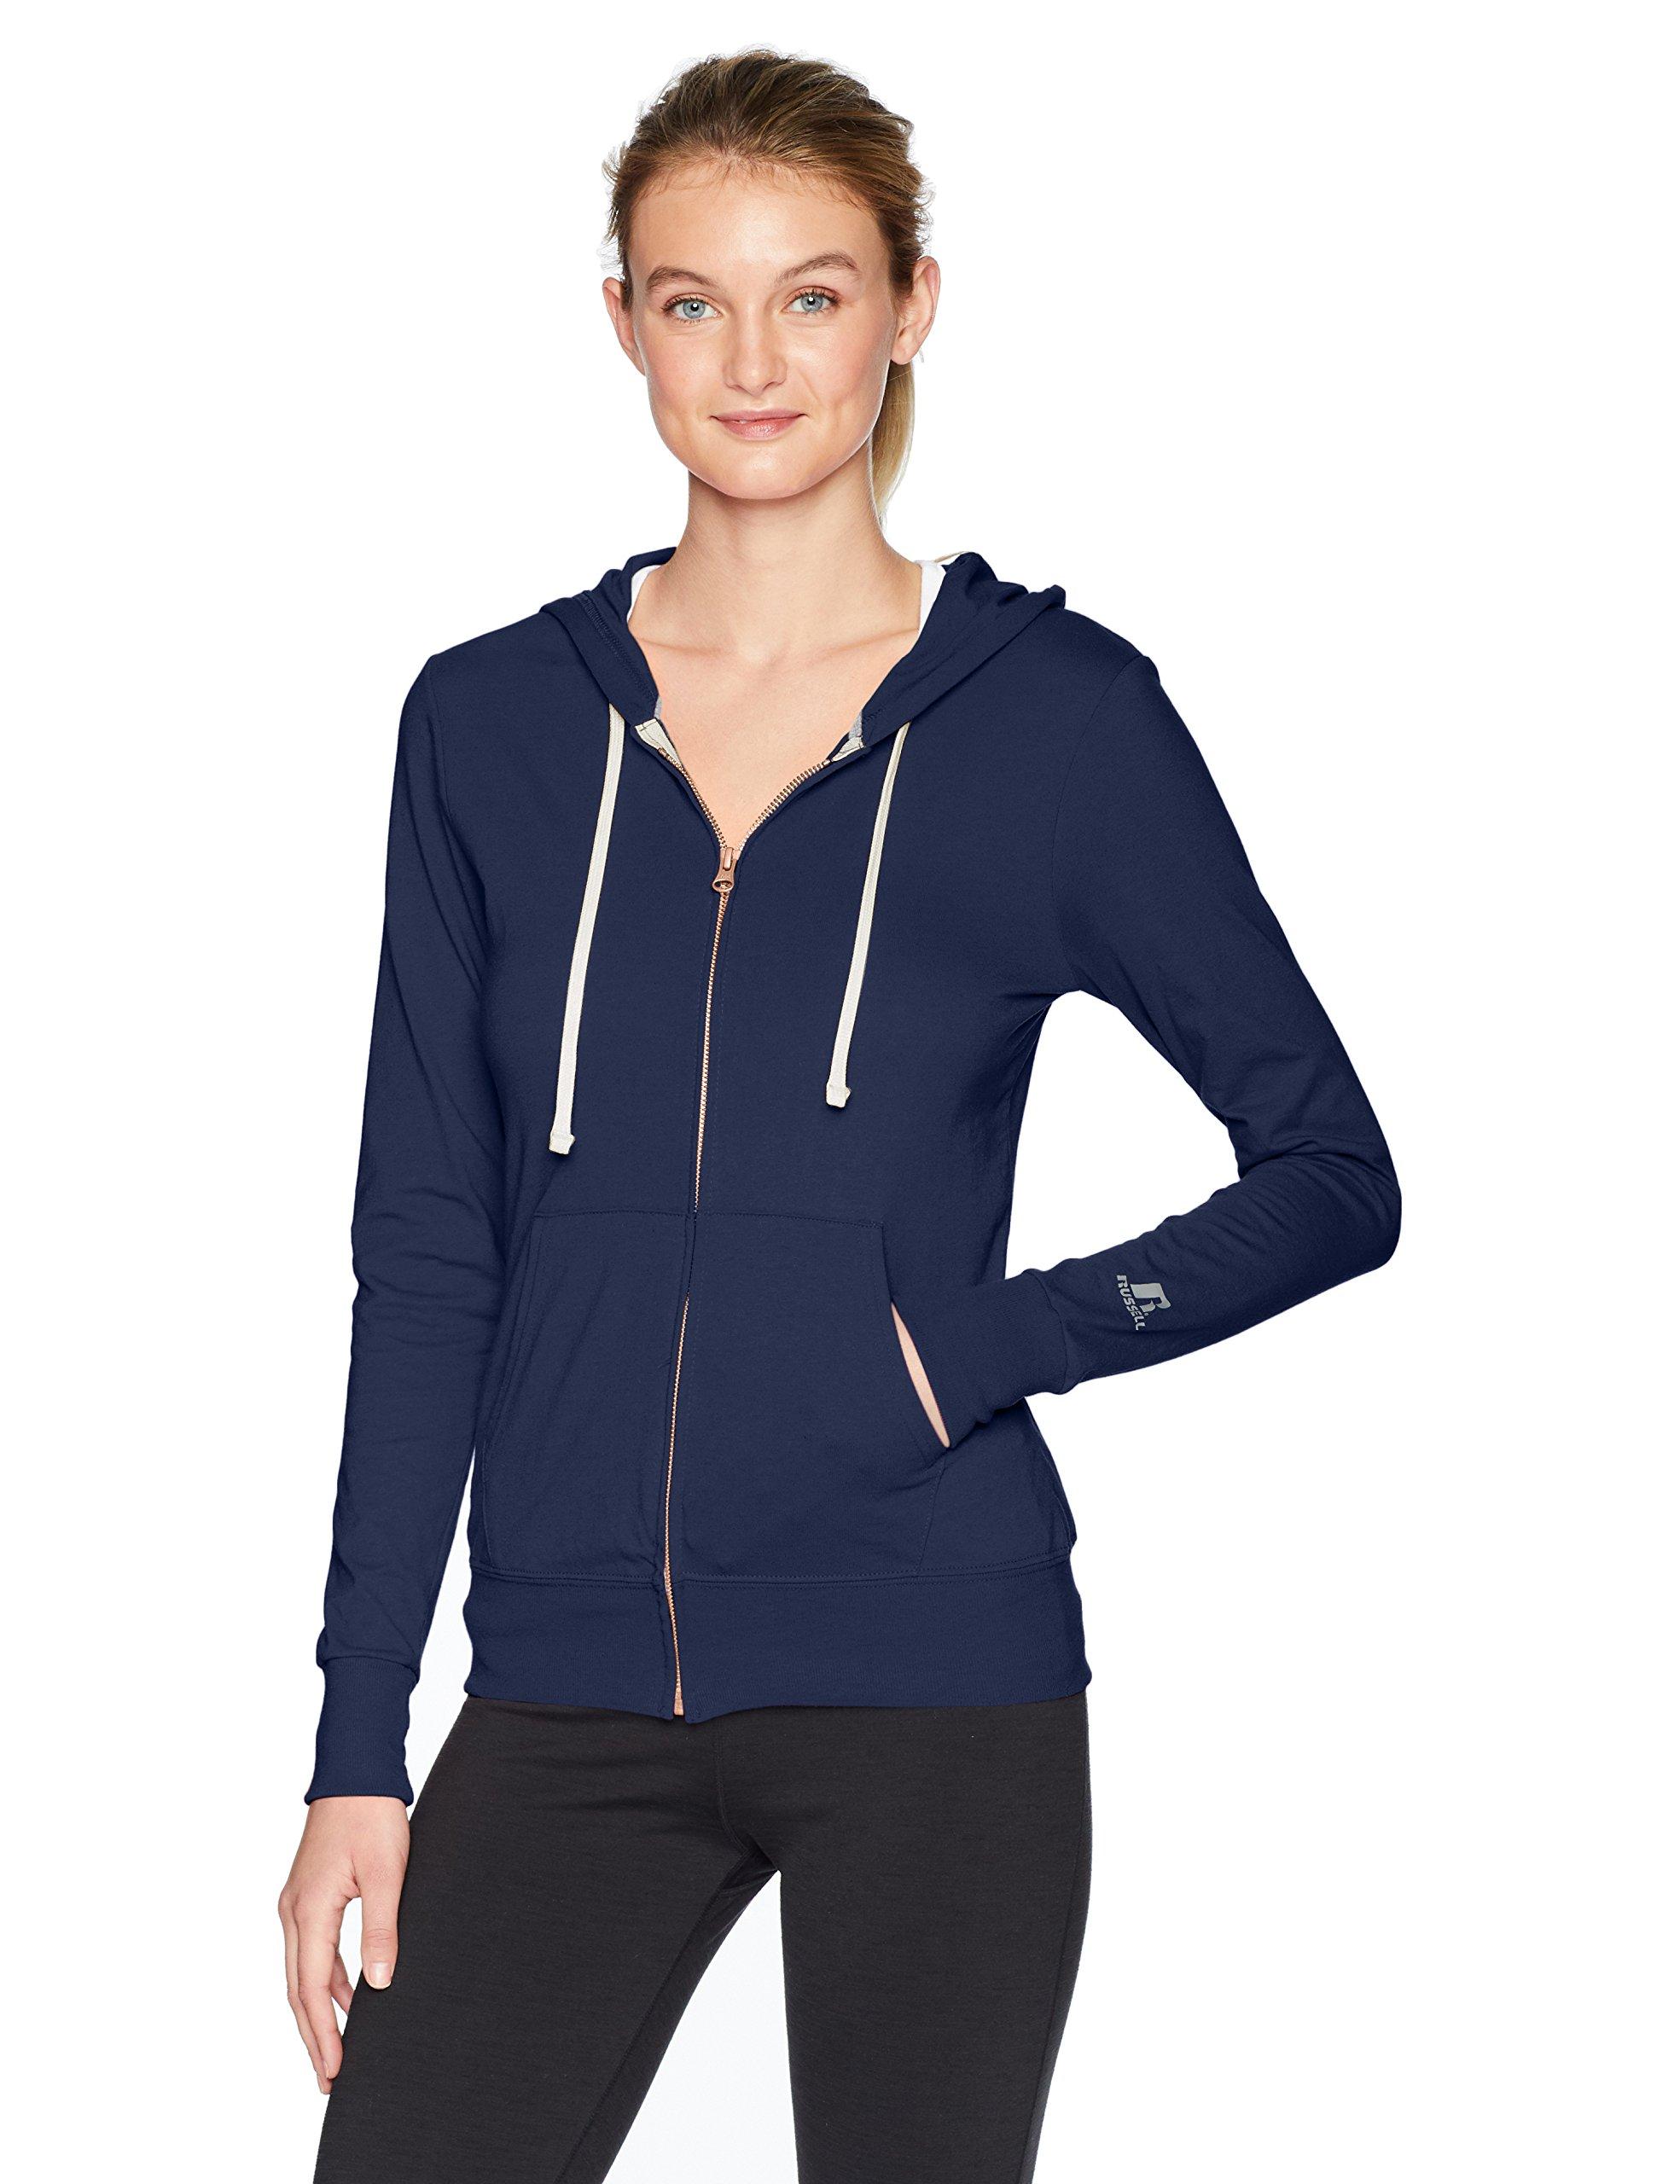 Russell Athletic Women's Essential Full Zip Jacket, Navy, Medium